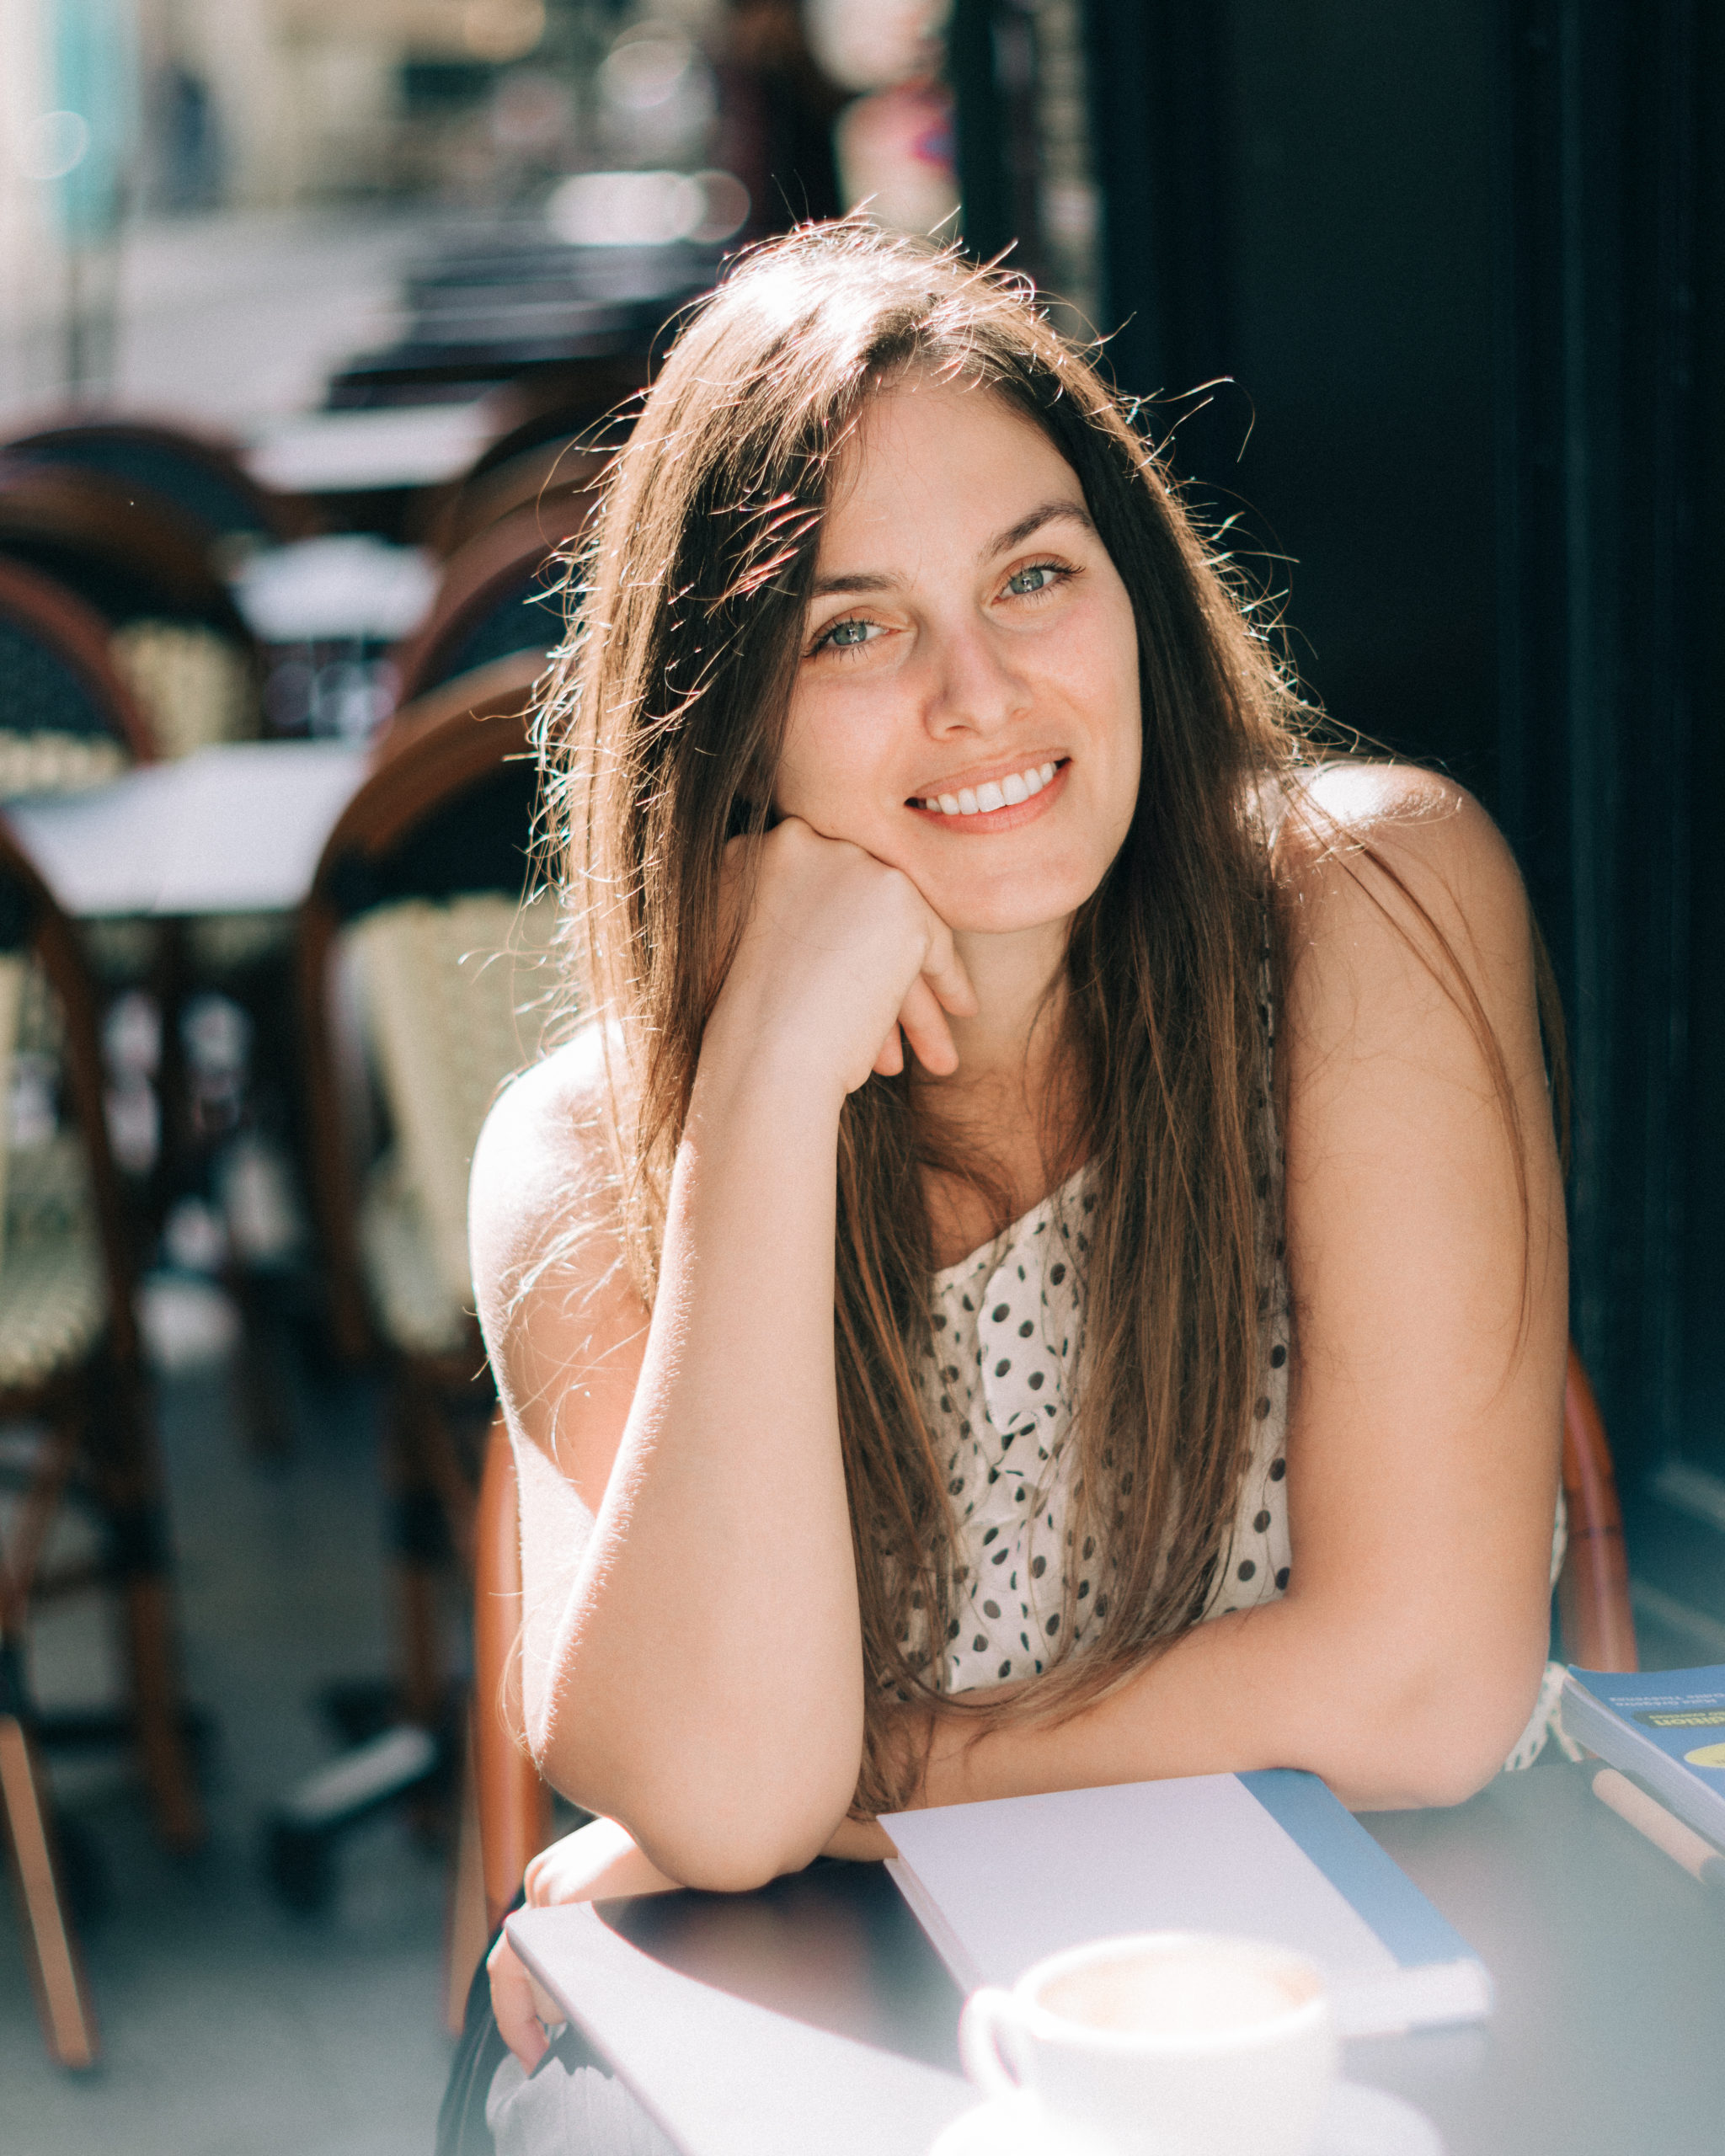 French teacher in Paris Yasmine Lesire